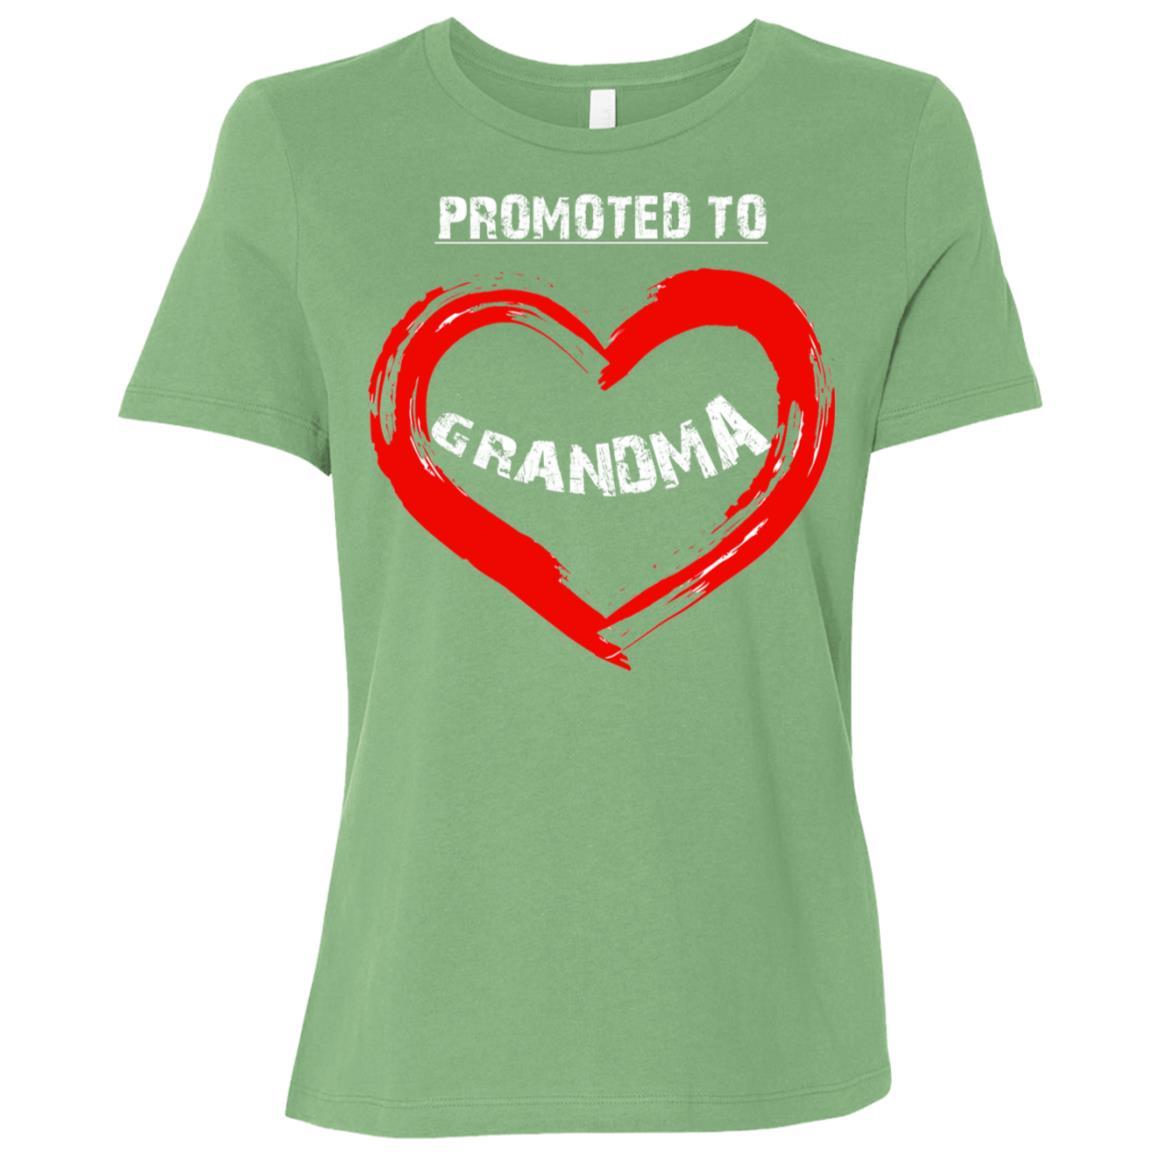 Promoted to grandma 2018-2 Women Short Sleeve T-Shirt